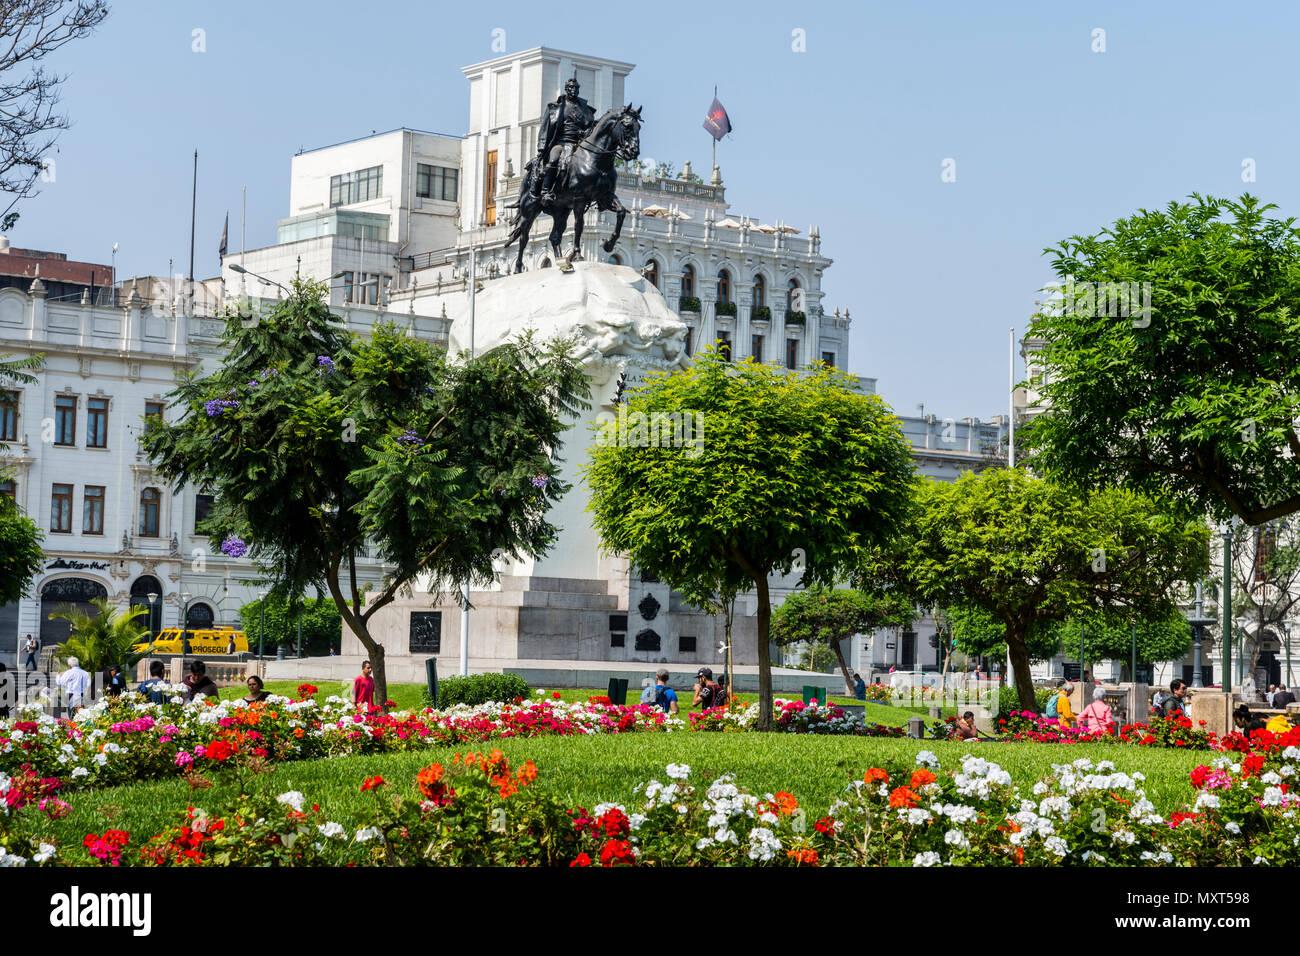 Plaza de San Martín and monument to José de San Martín.Lima city, Peru. - Stock Image